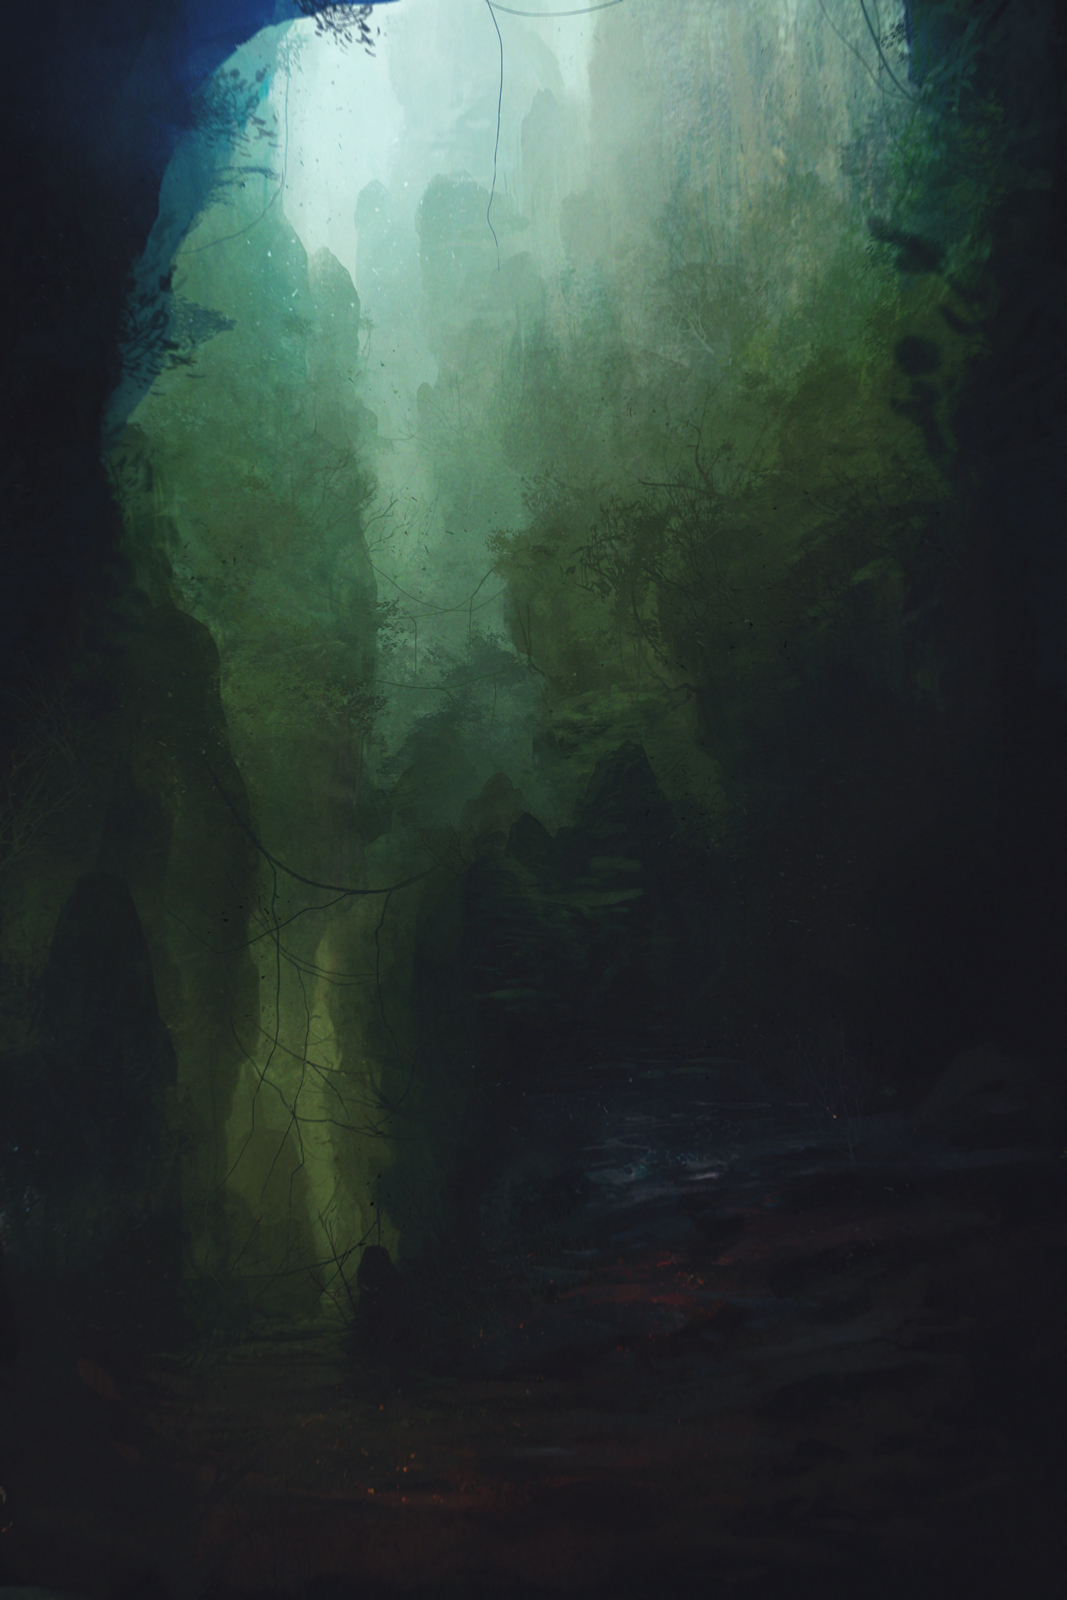 Jungle_Cave by GabrielWigren